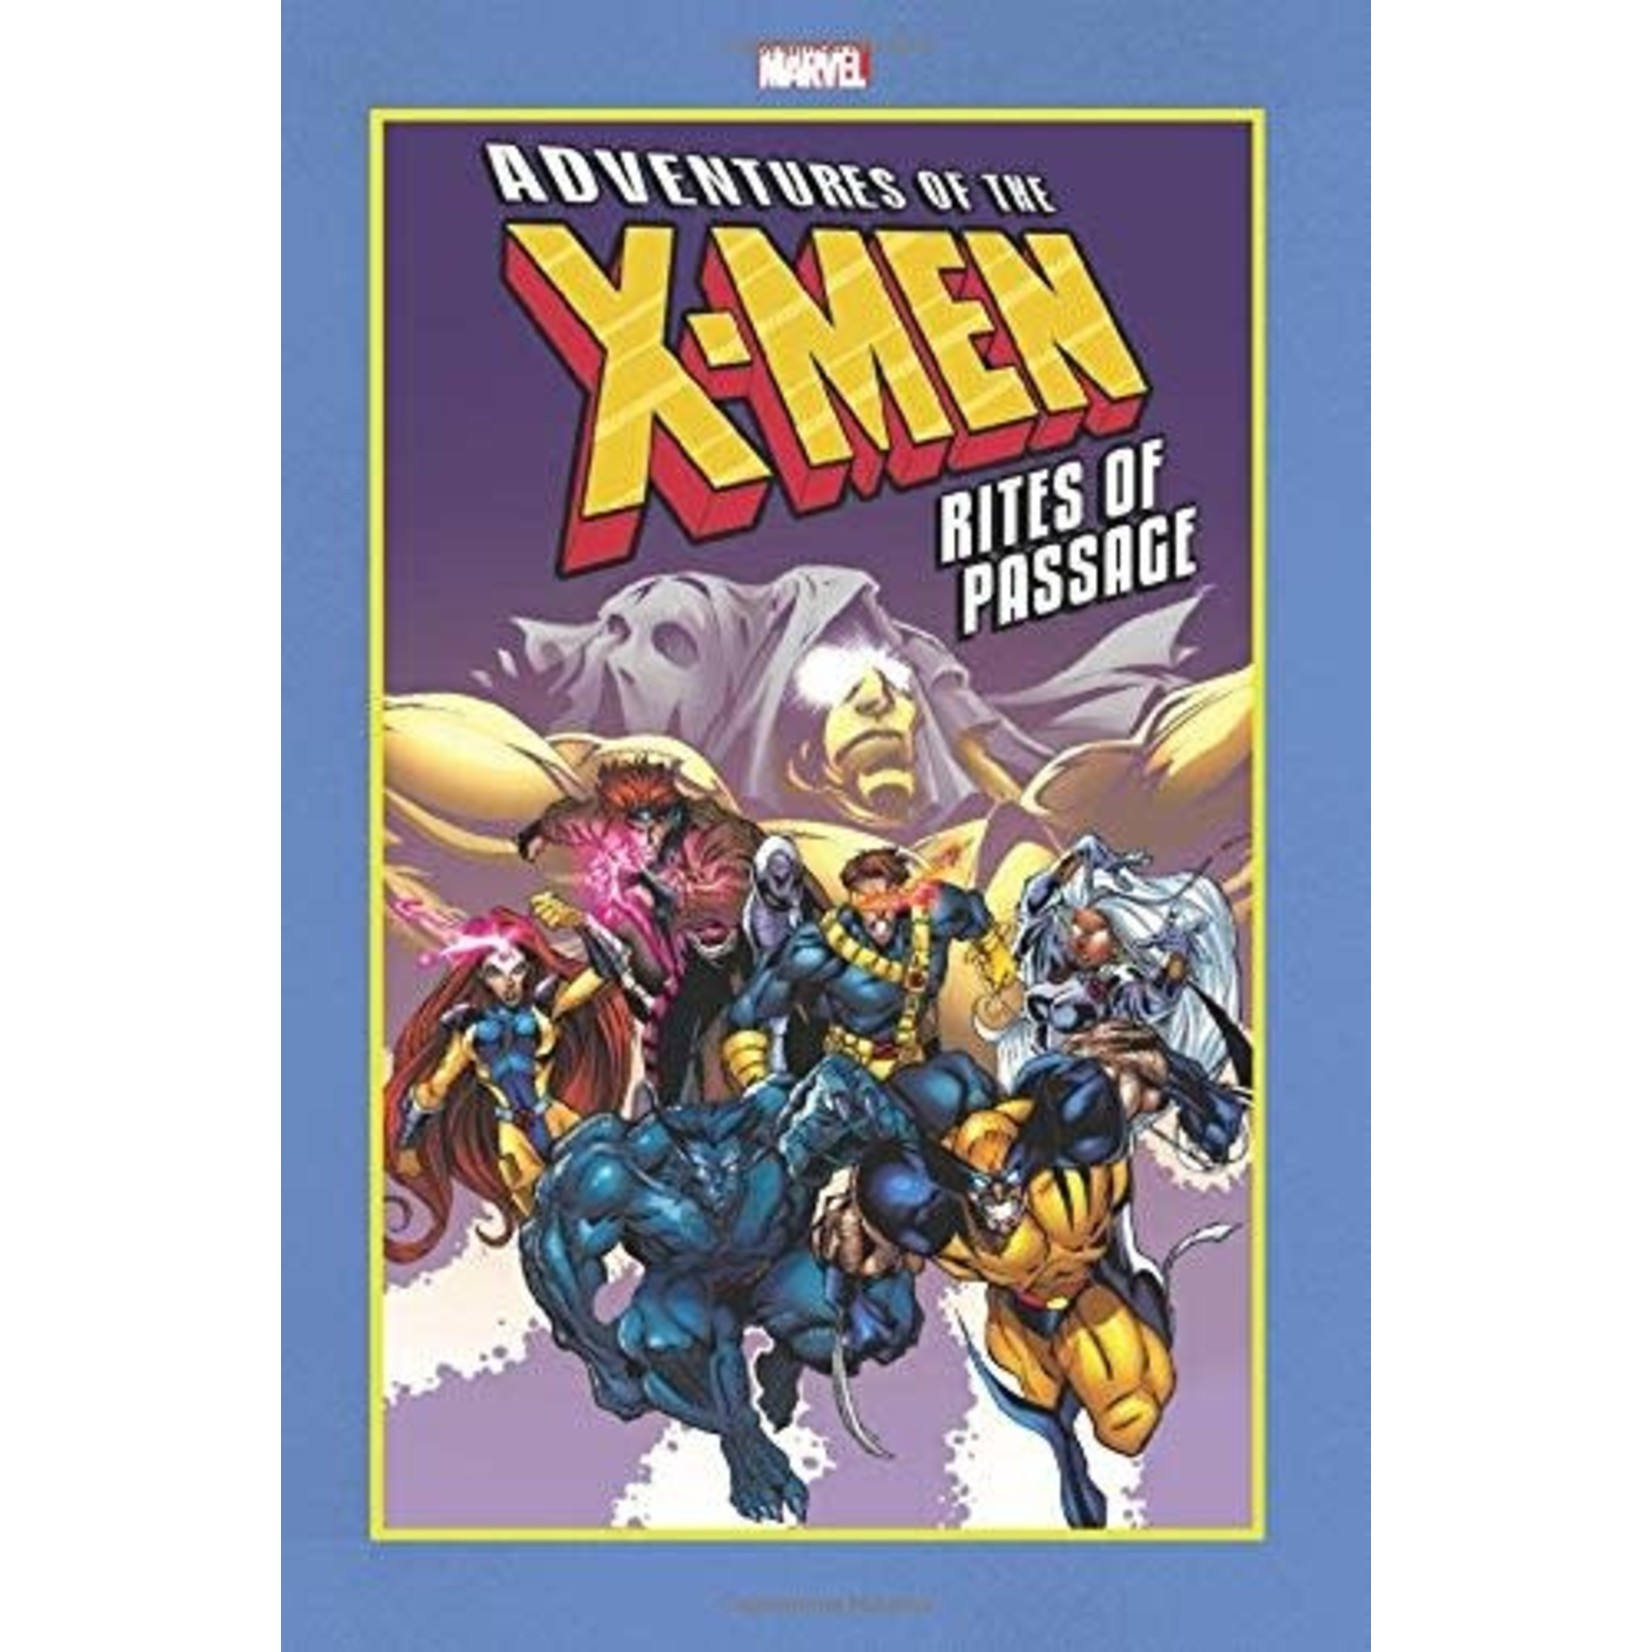 Adventures of the X-Men: Rites of Passage